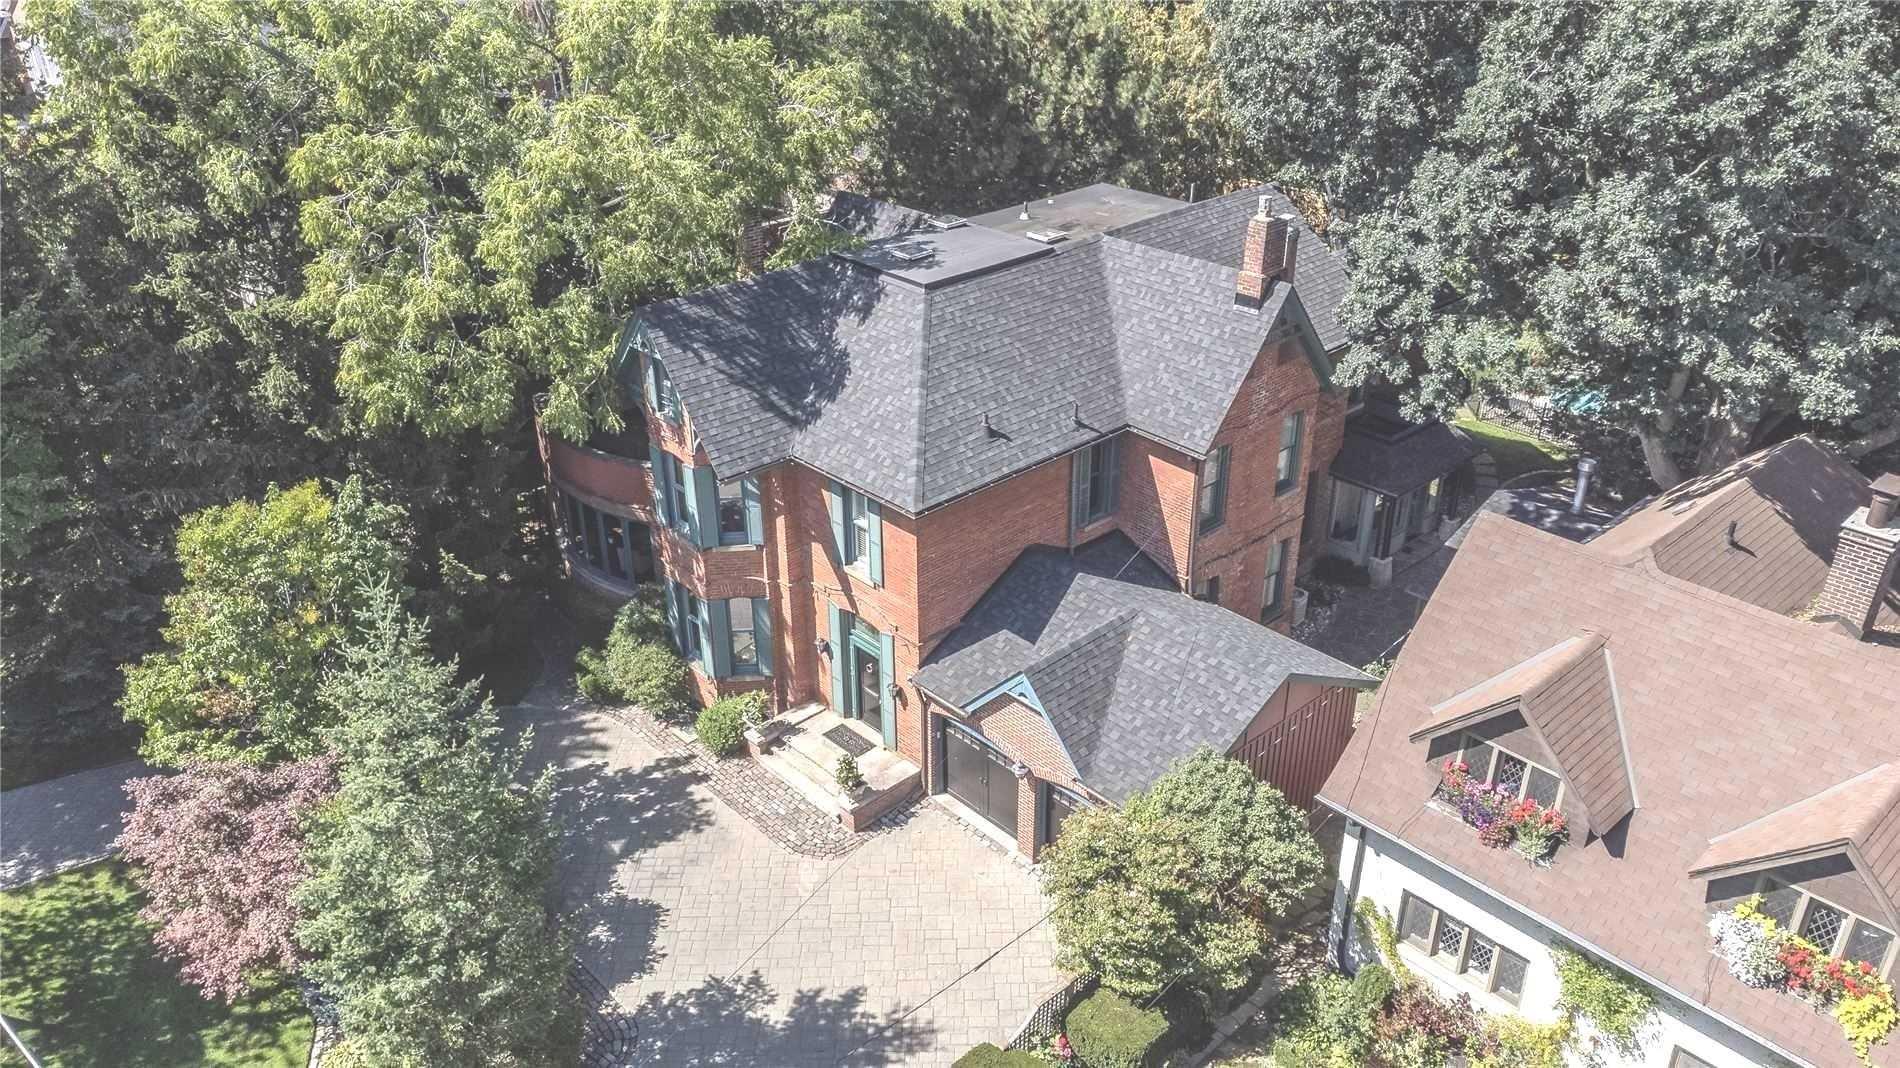 98 Blythwood Rd, Toronto, Ontario M4N1A4, 8 Bedrooms Bedrooms, 15 Rooms Rooms,5 BathroomsBathrooms,Detached,For Sale,Blythwood,C5399961